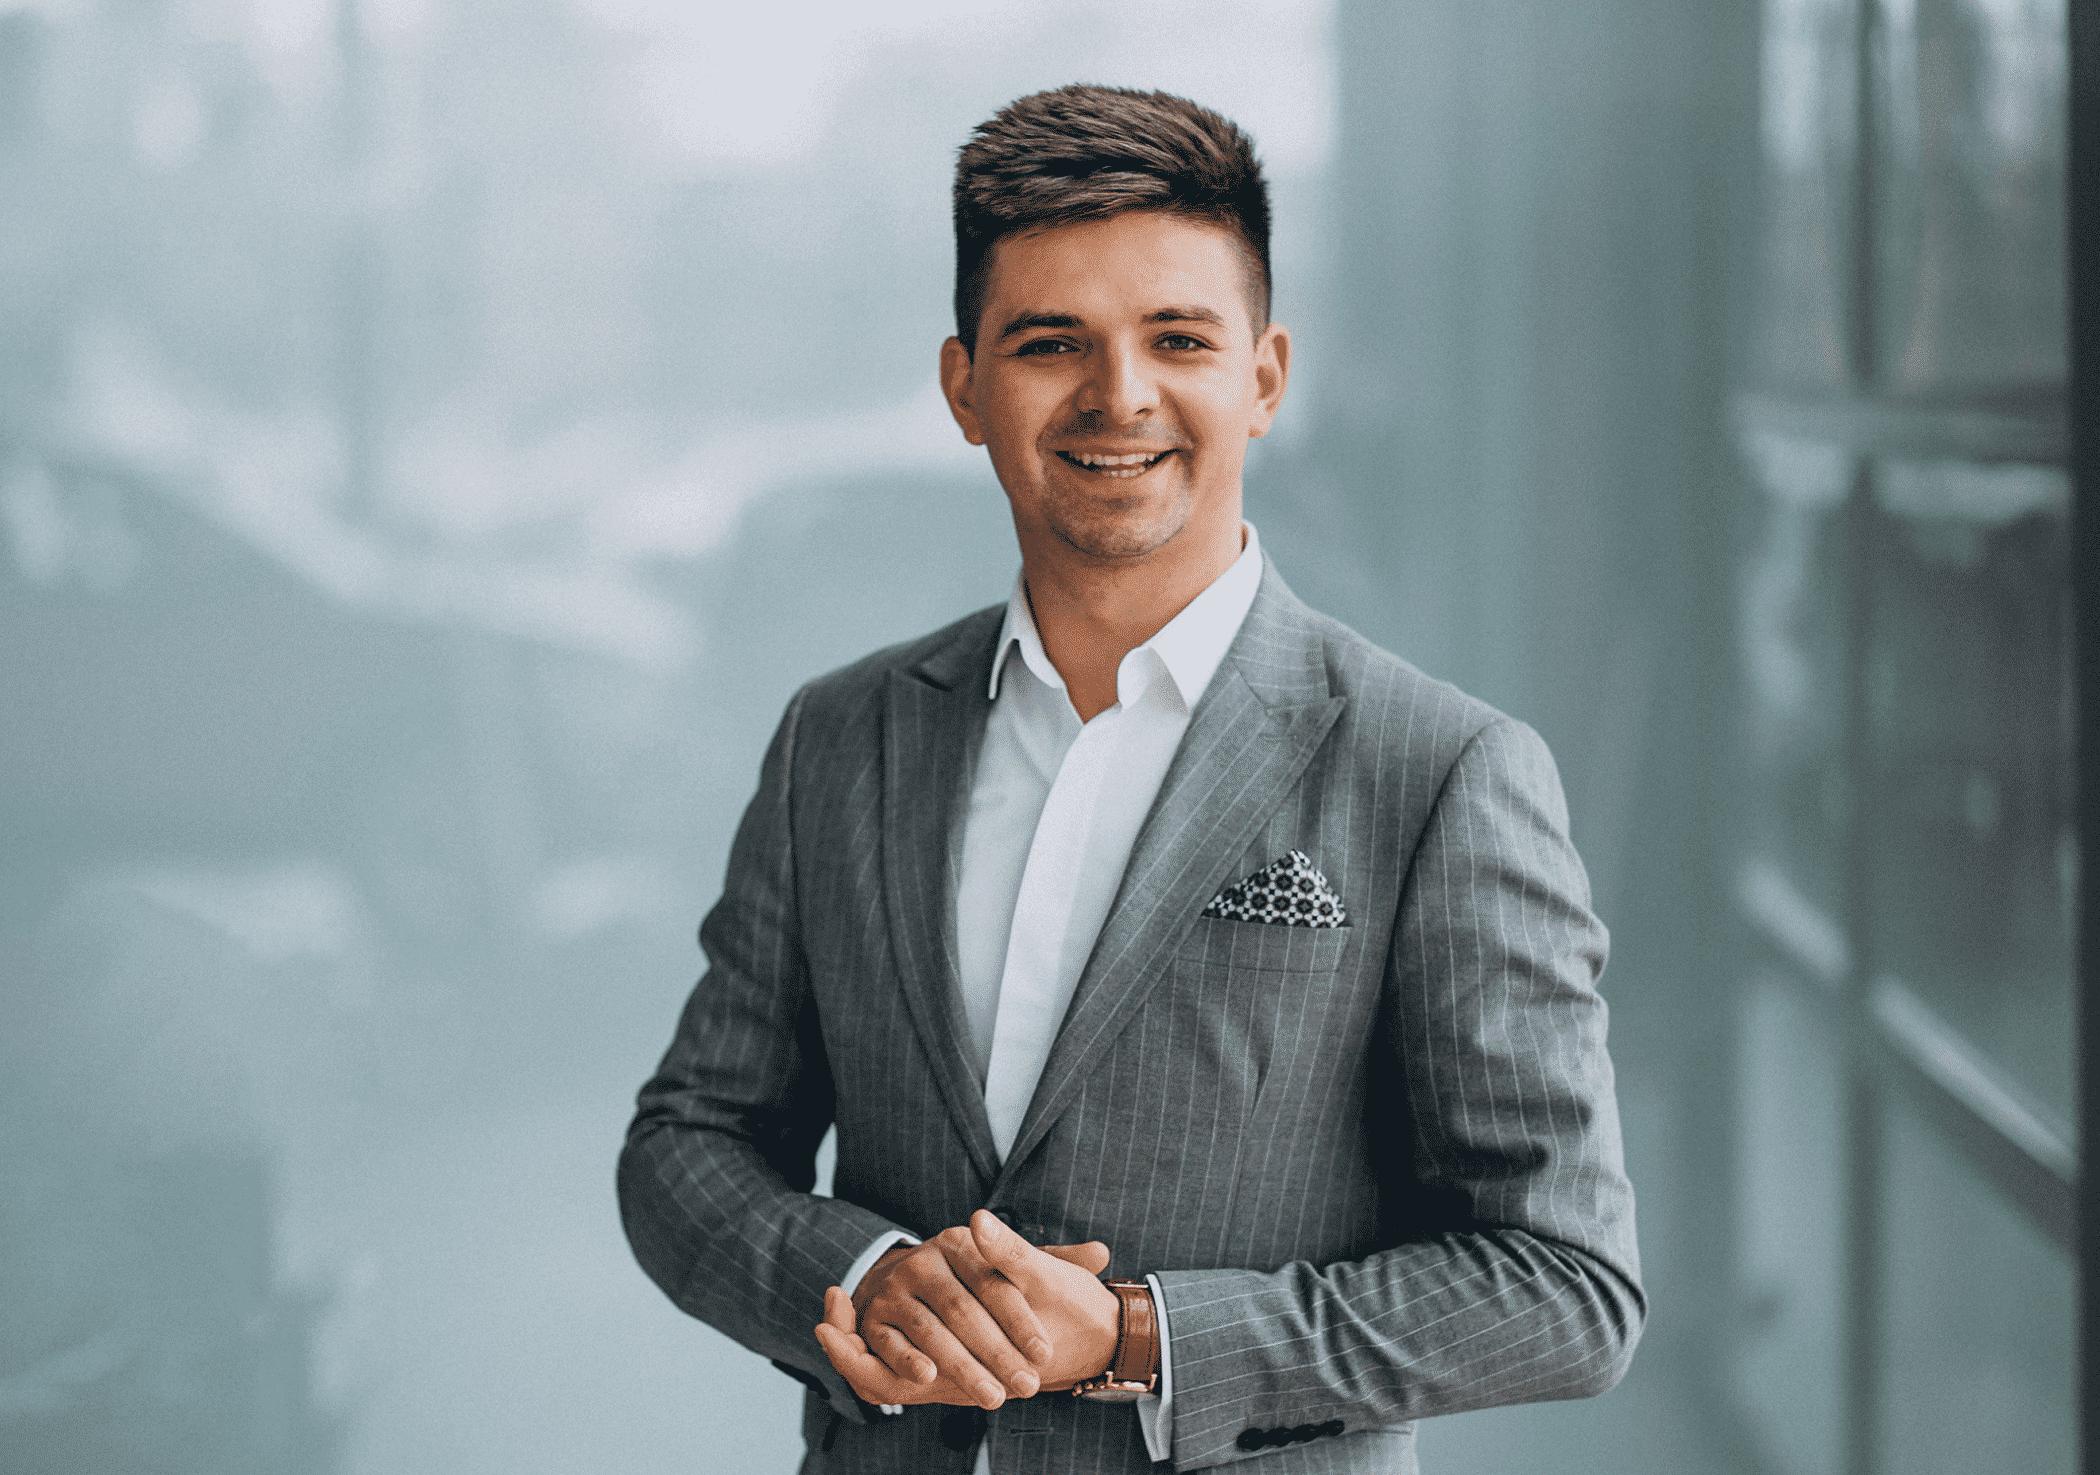 Business Intelligence manager | Inhuur interim manager business analytics